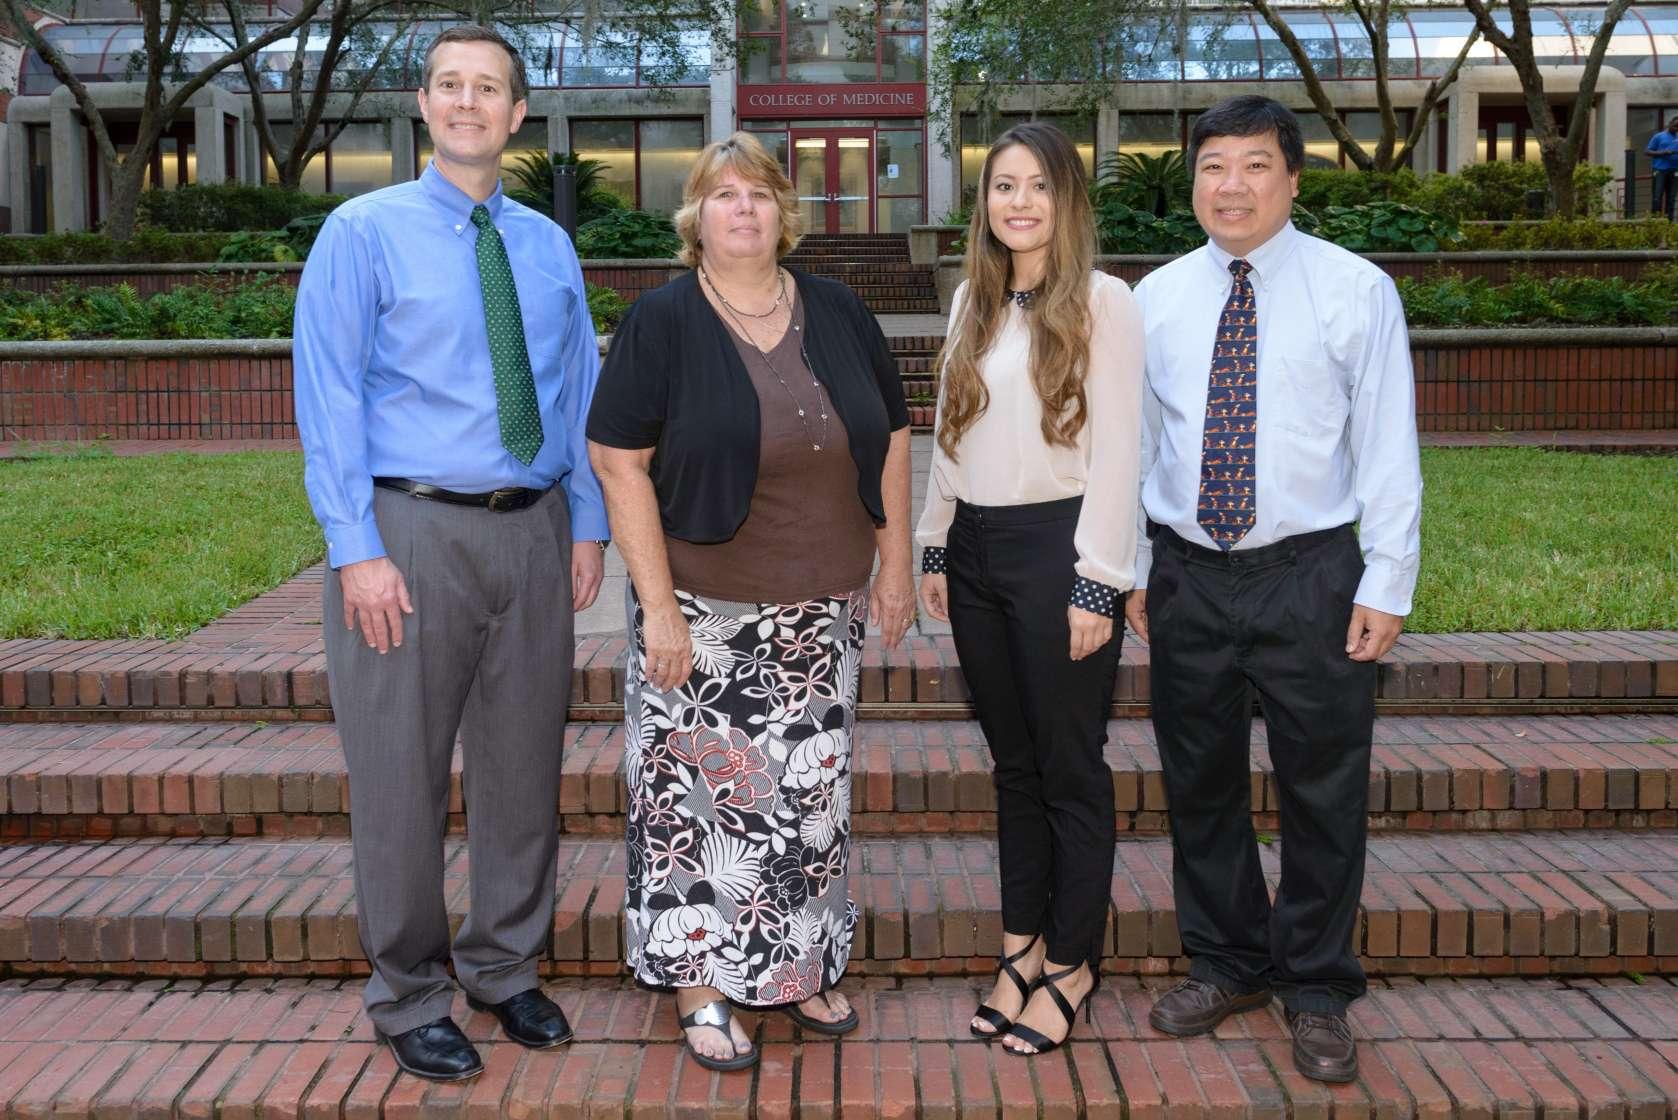 Hemophilia and Hemostasis Treatment Center Team Photo